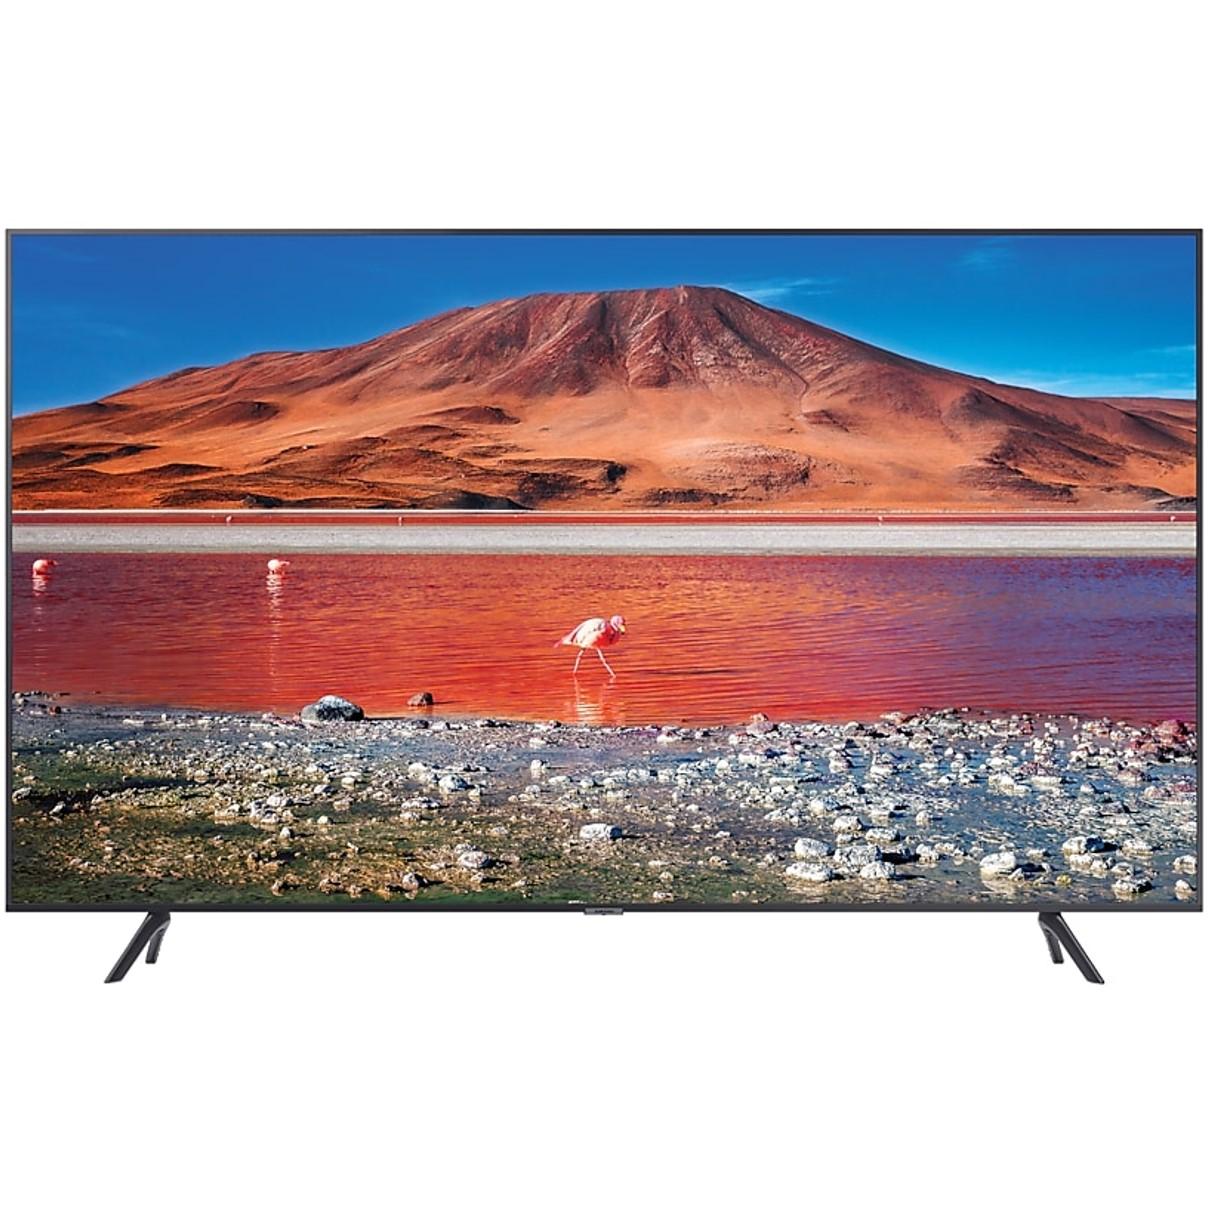 Tv samsung 50pulgadas led 4k uhd -  ue50tu7105 -  gama 2020 -  hdr10+ -  smart tv -  2 hdmi -  1 usb -  wifi -  tdt2